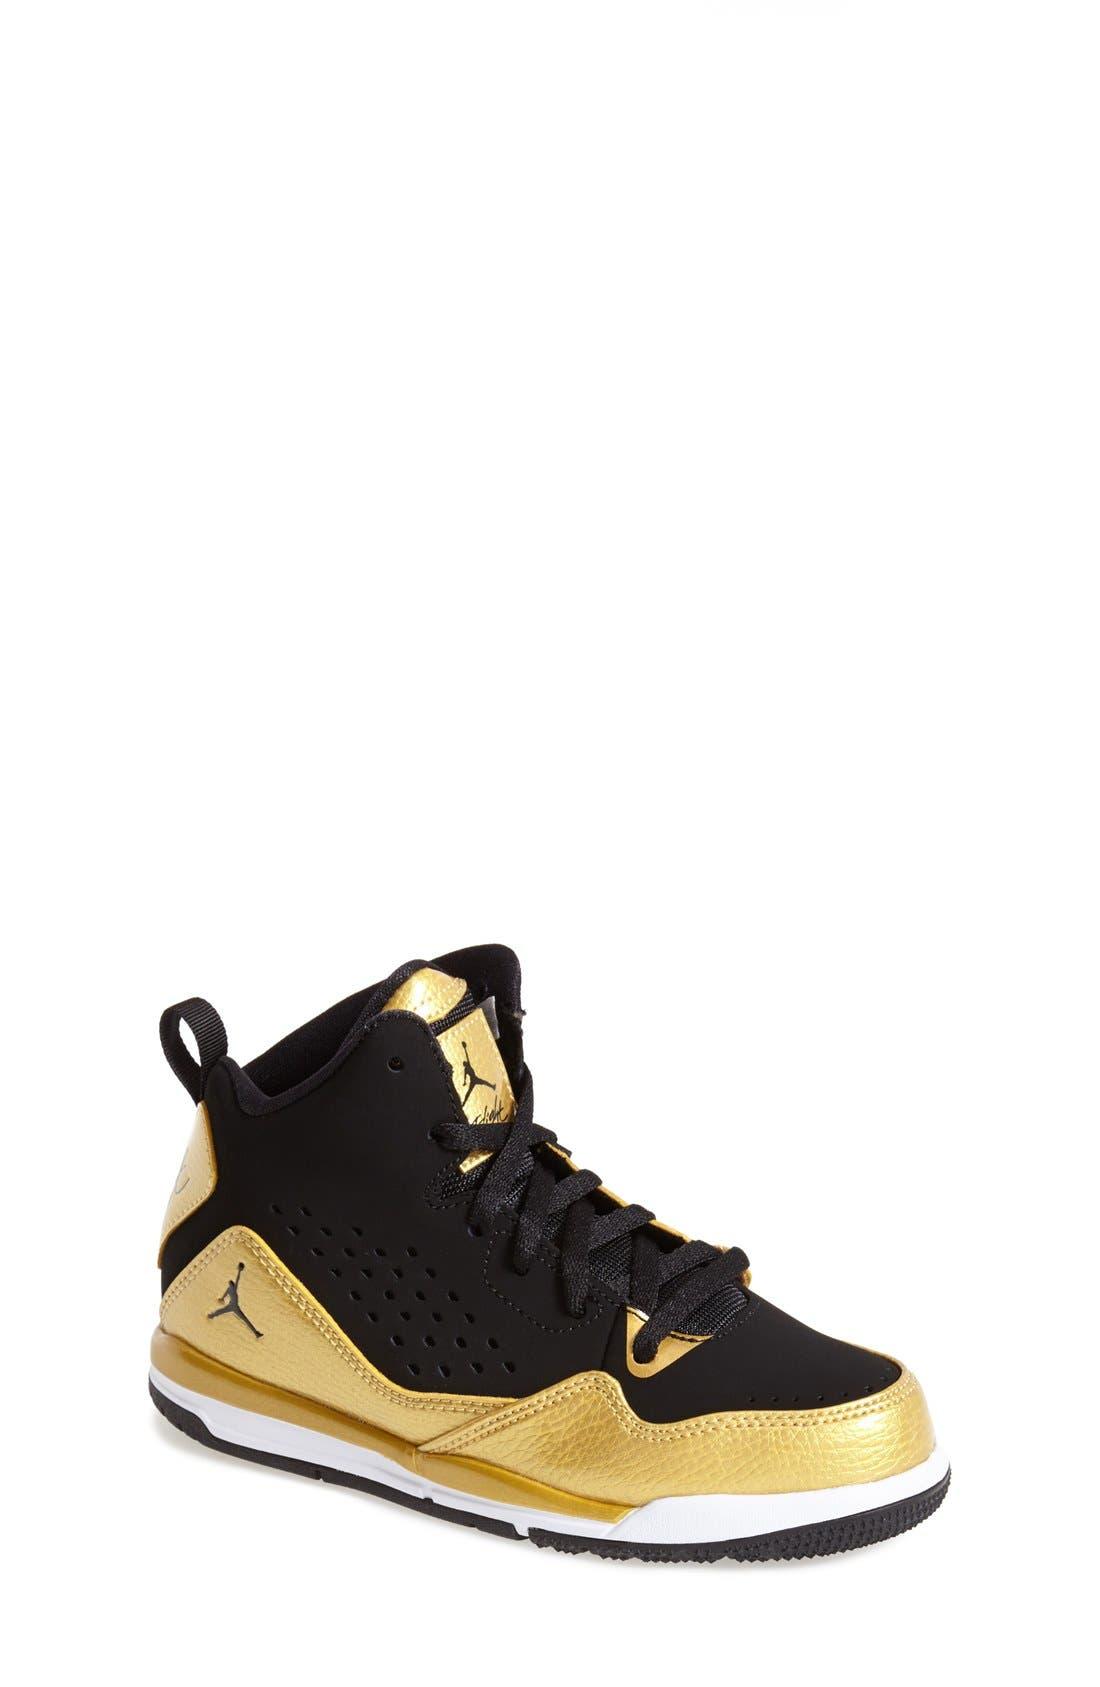 Alternate Image 1 Selected - Nike 'Jordan SC3' Basketball Shoe (Toddler & Little Kid)